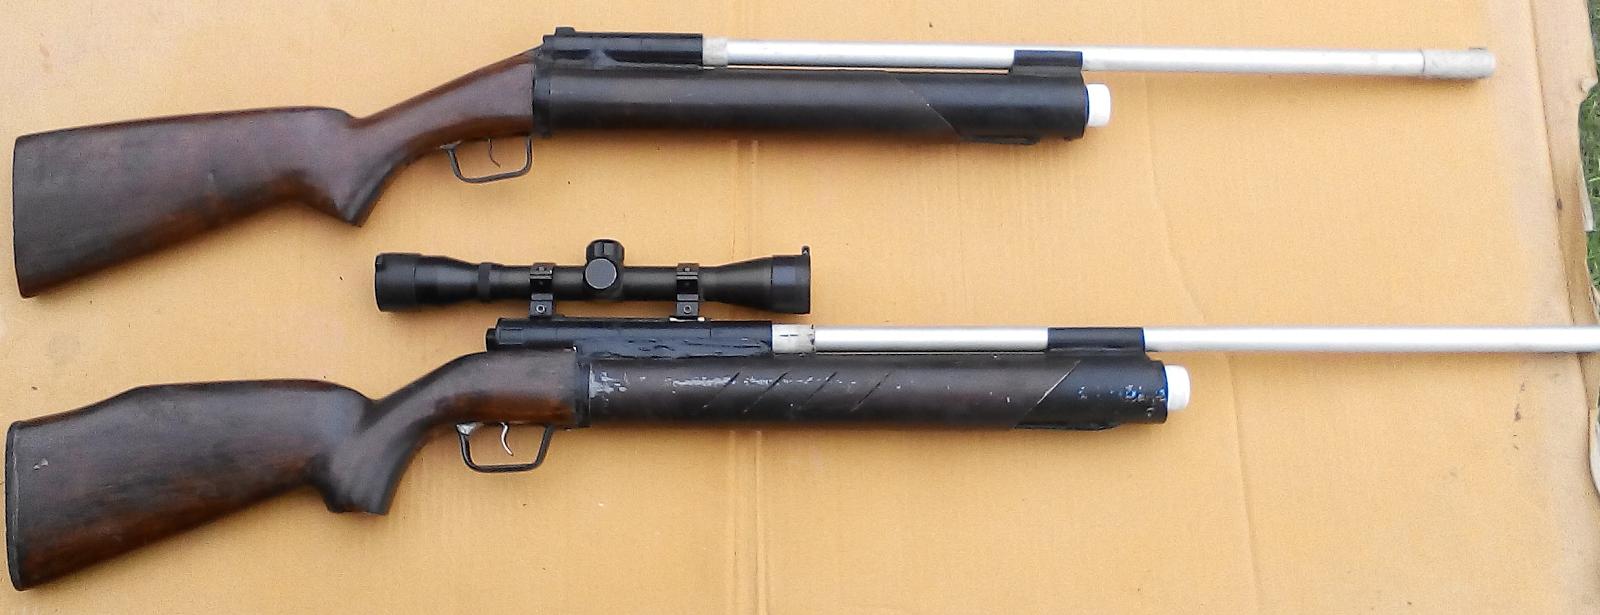 Marble gun for sale